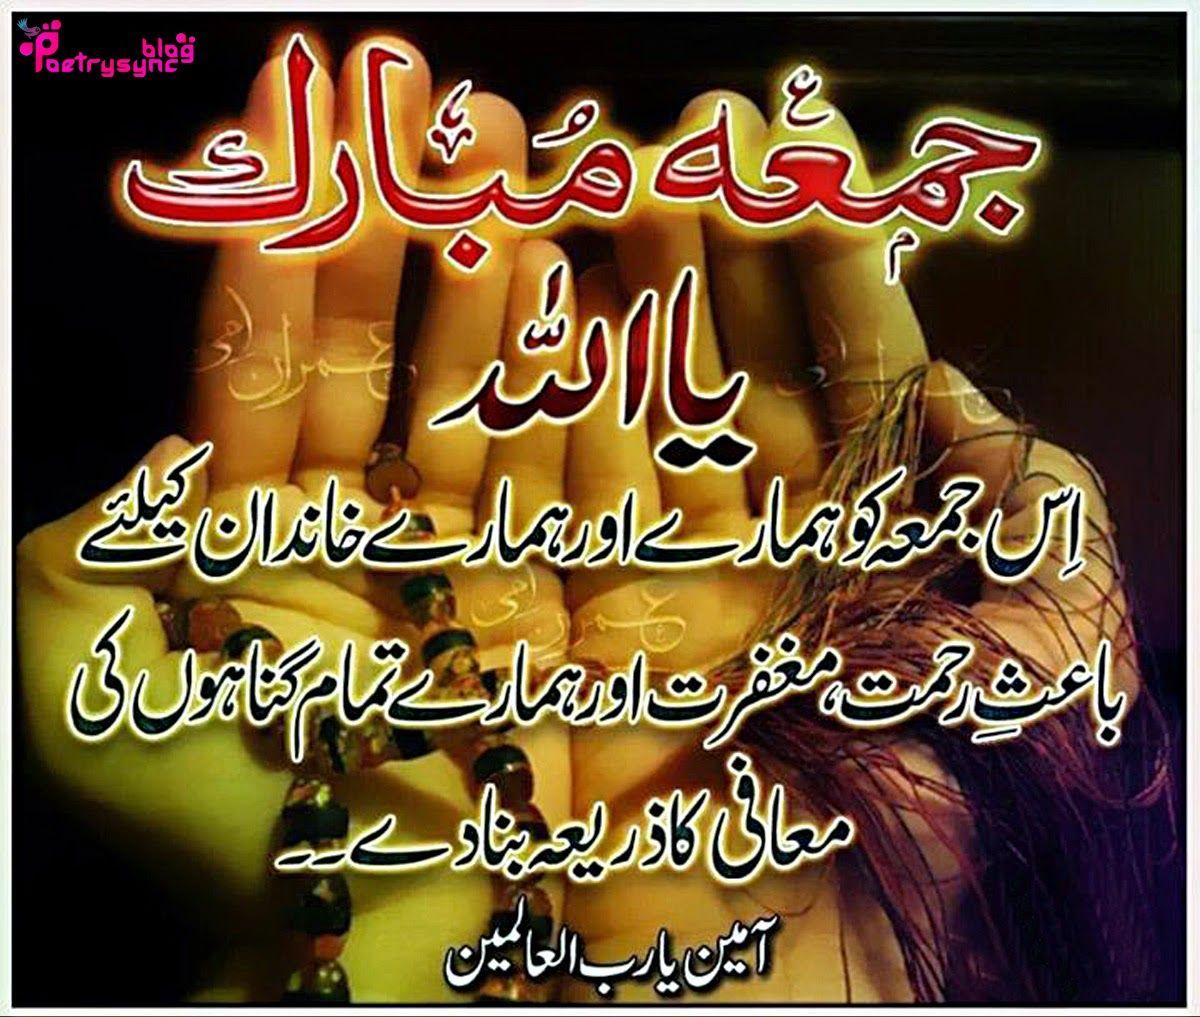 Poetry jumma mubarak urdu images for facebook status jumma jumma mubarak islamic hadees sms in urdu and english kristyandbryce Choice Image